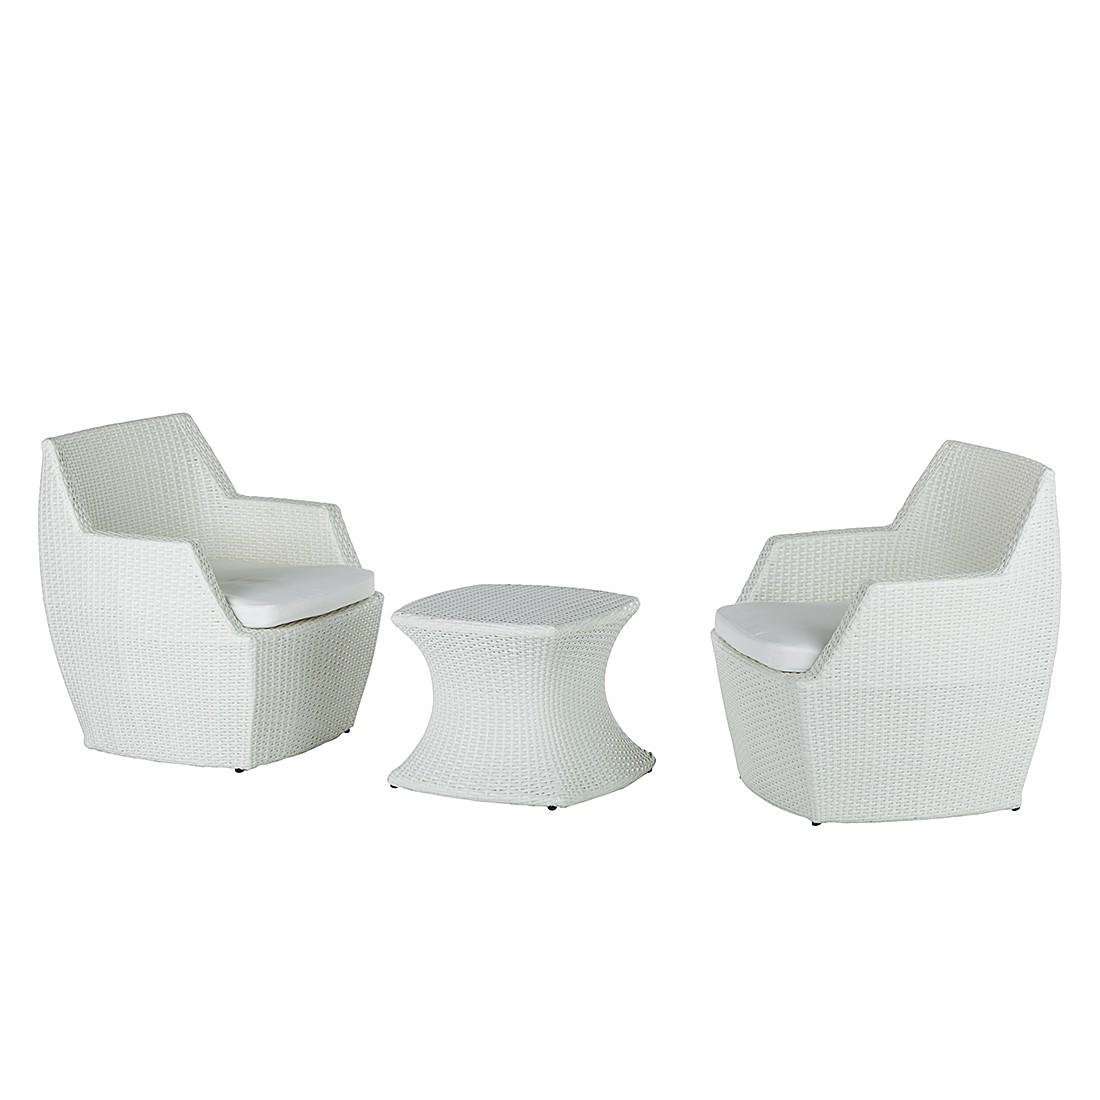 Sitzgruppe White Cloud (3-teilig) - Polyrattan/Stoff - Weiß, Kings Garden